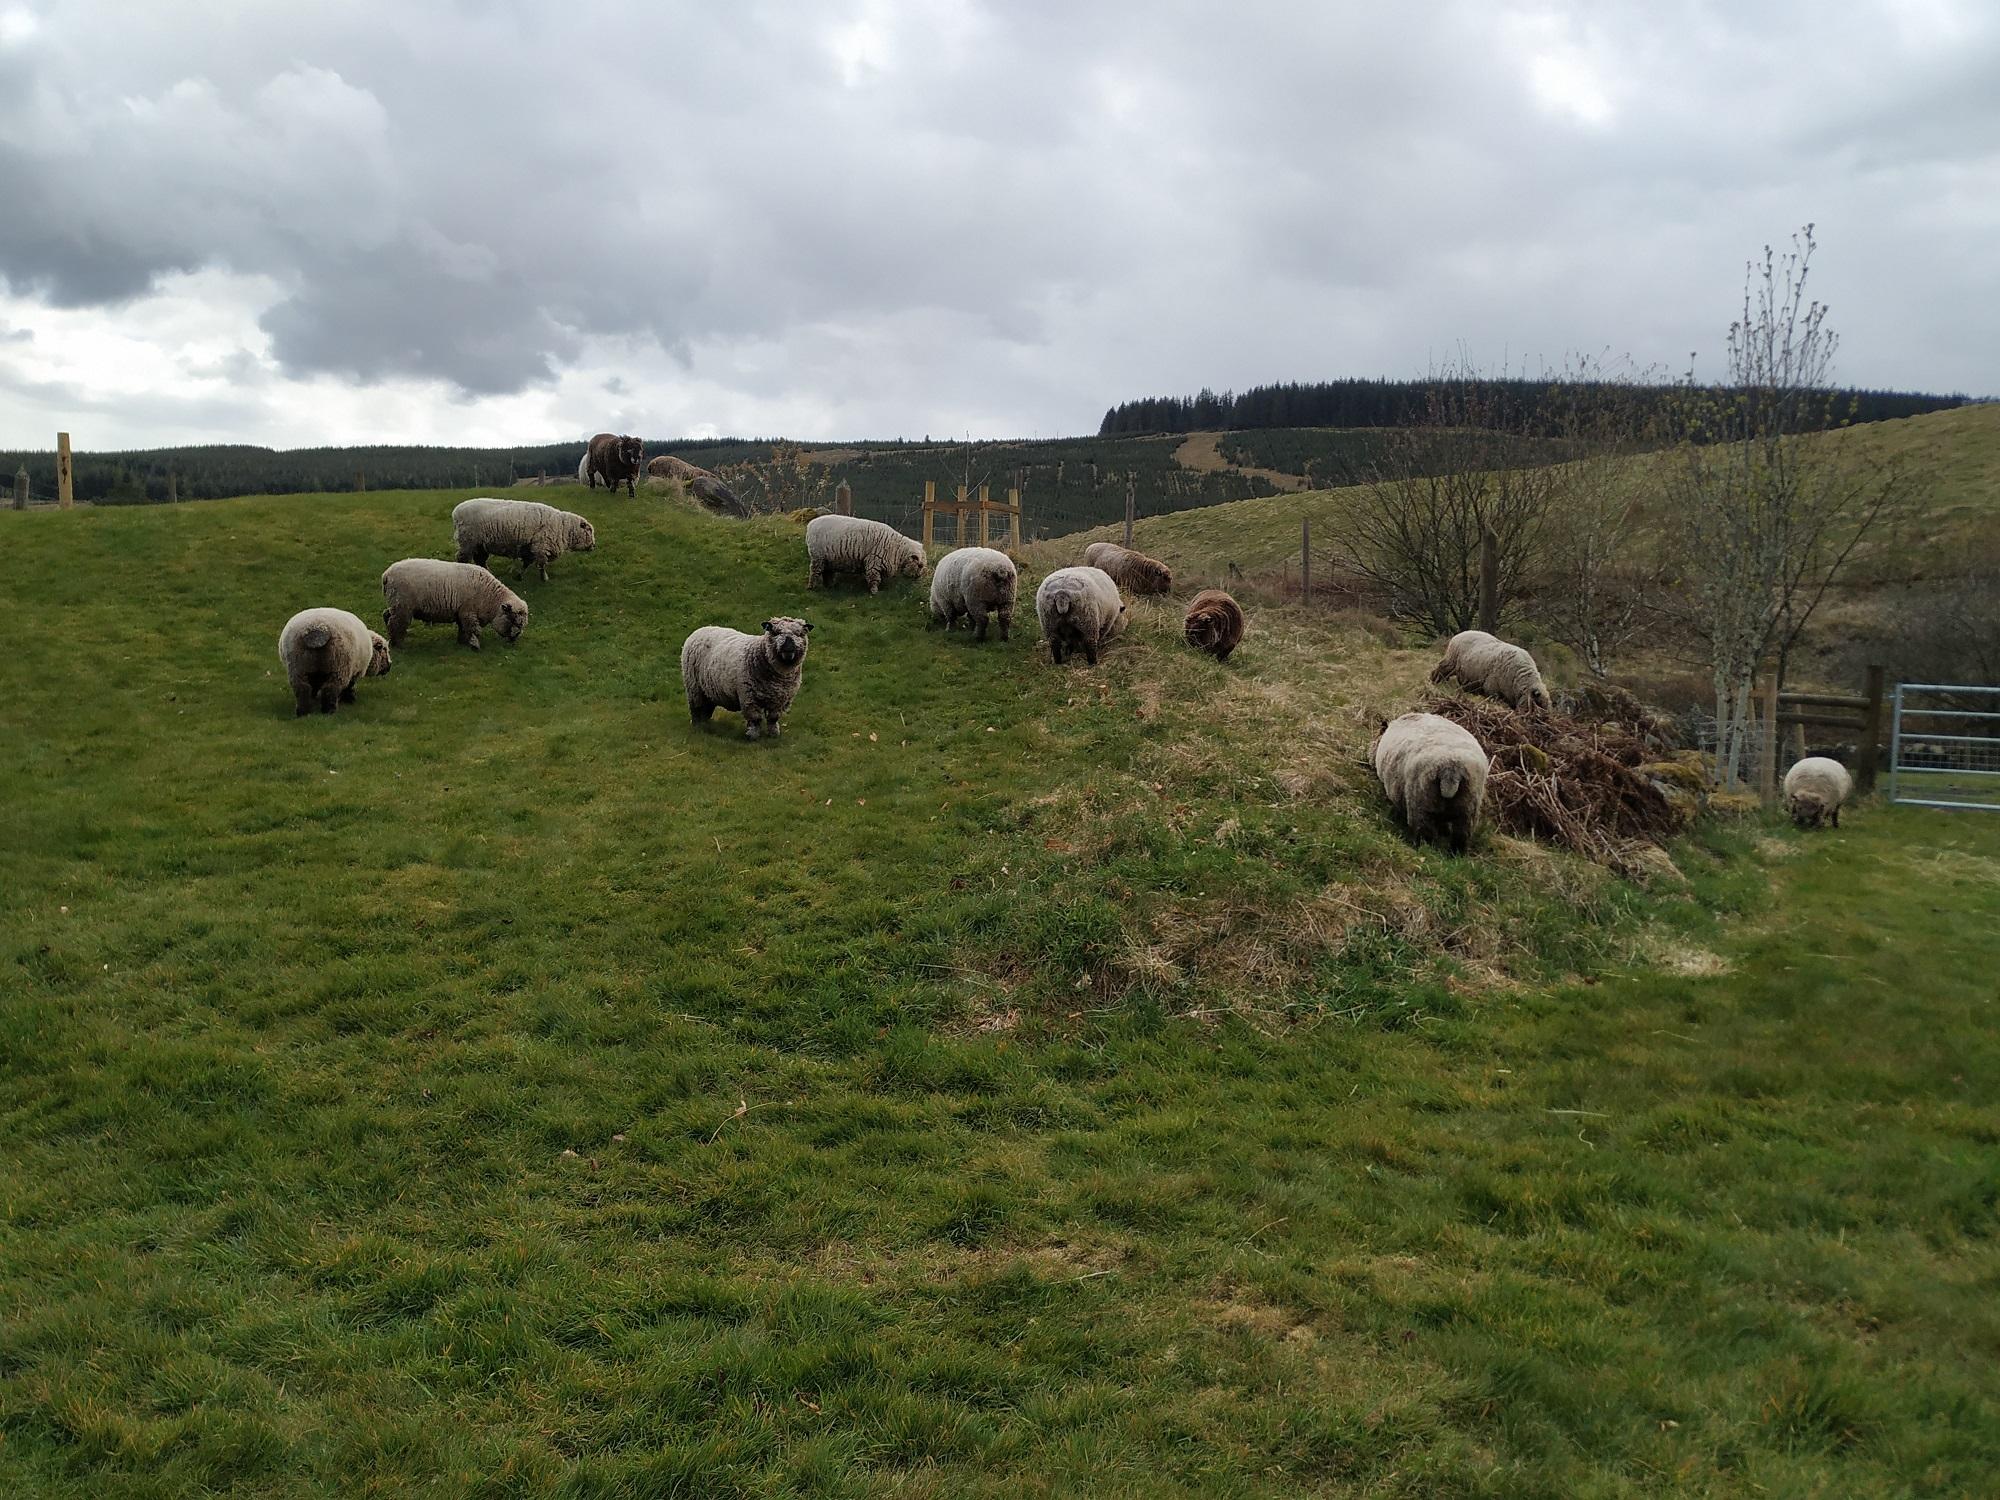 new paddock with sheep